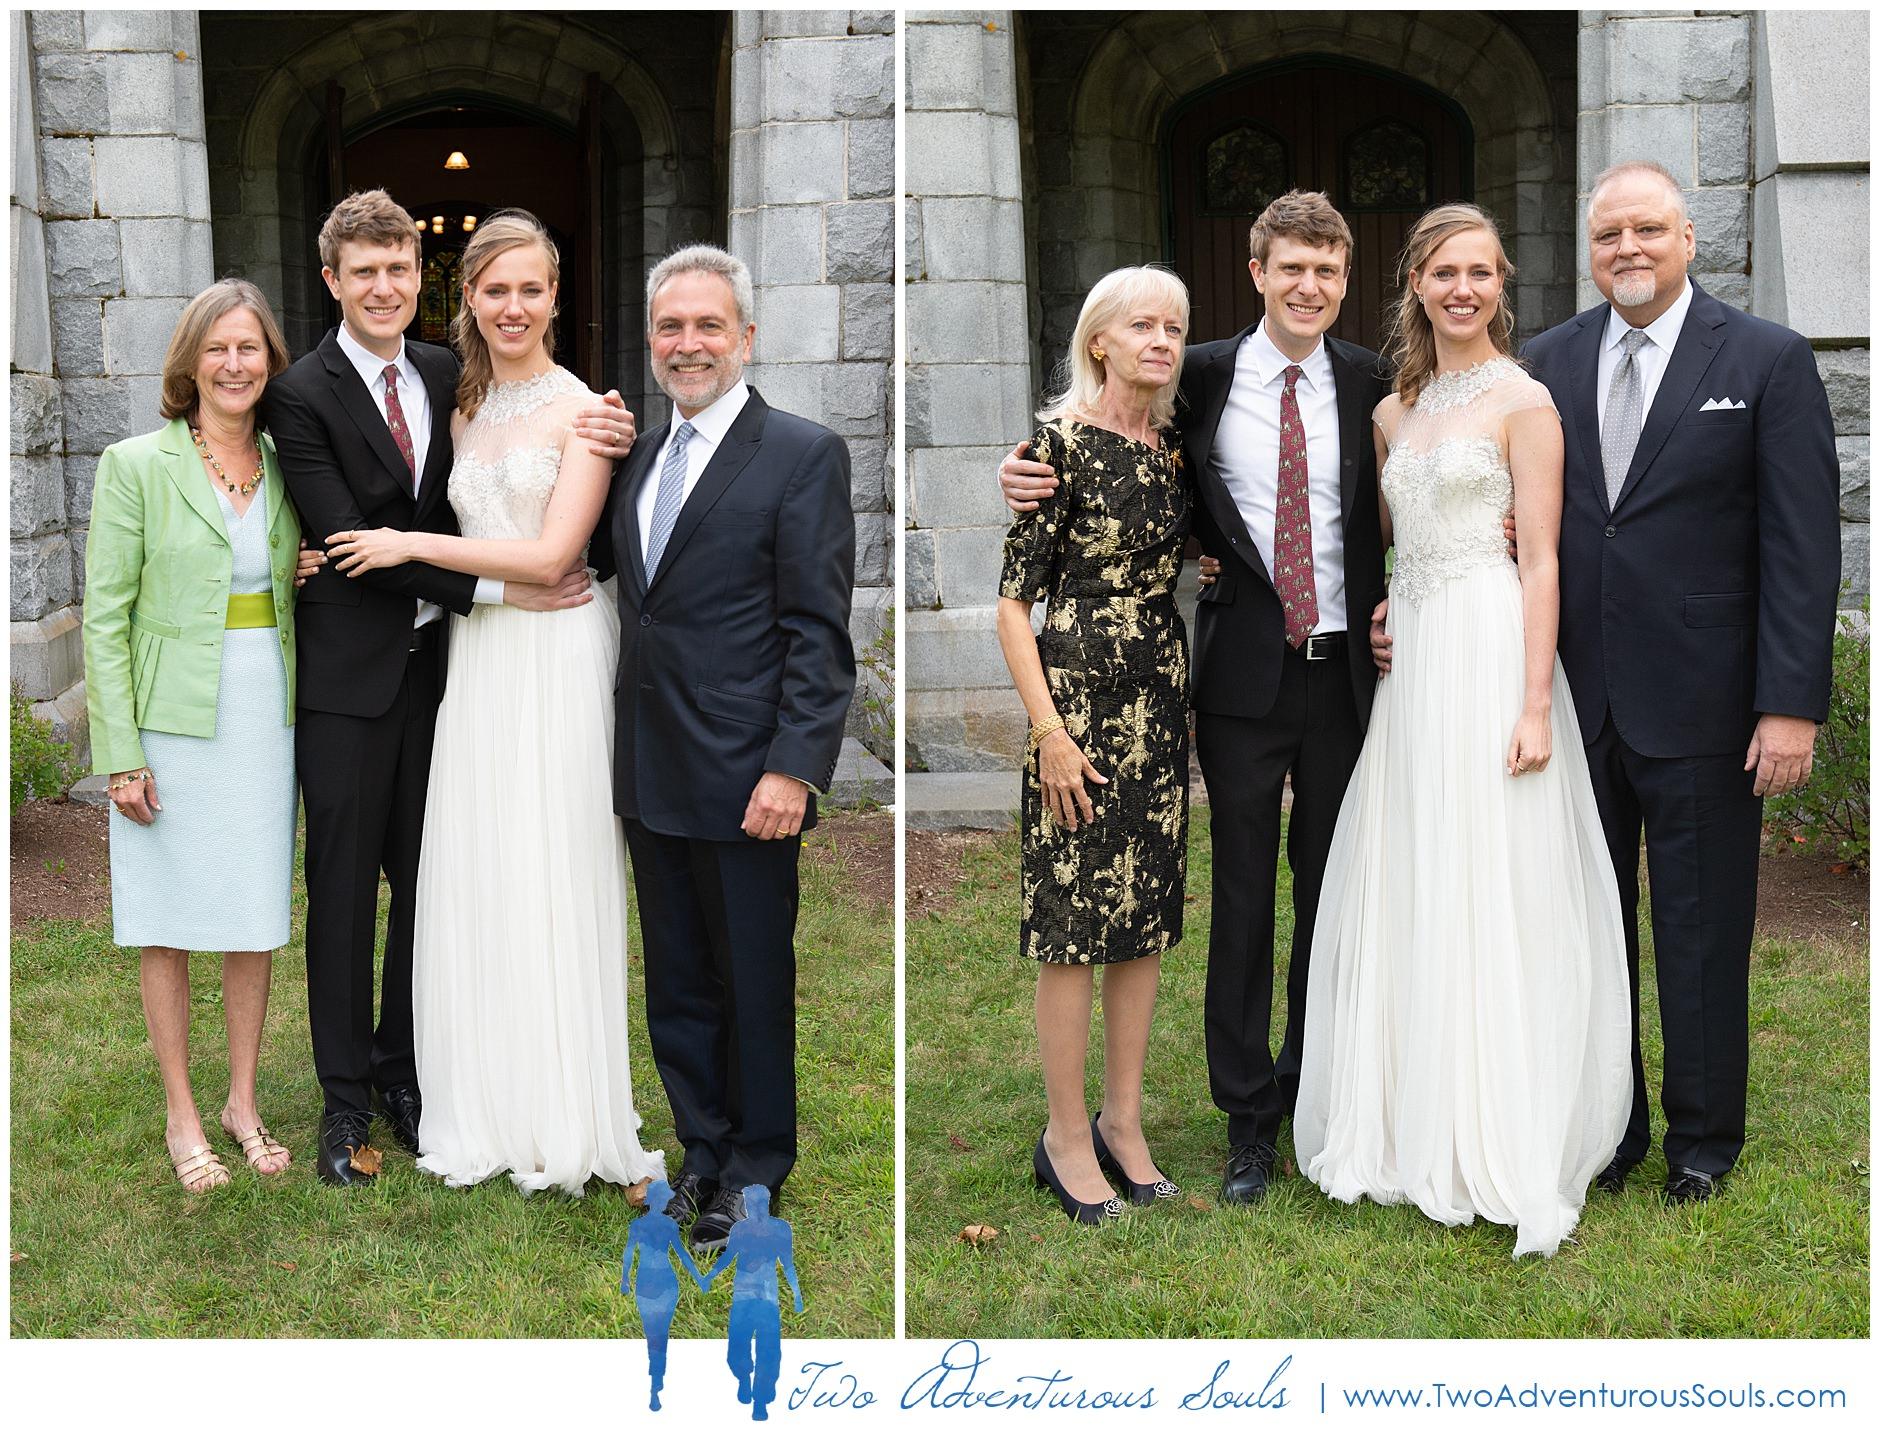 Grace Maine Photographers, Portland Maine Wedding Photographers, Two Adventurous Souls- 090719_0029.jpg